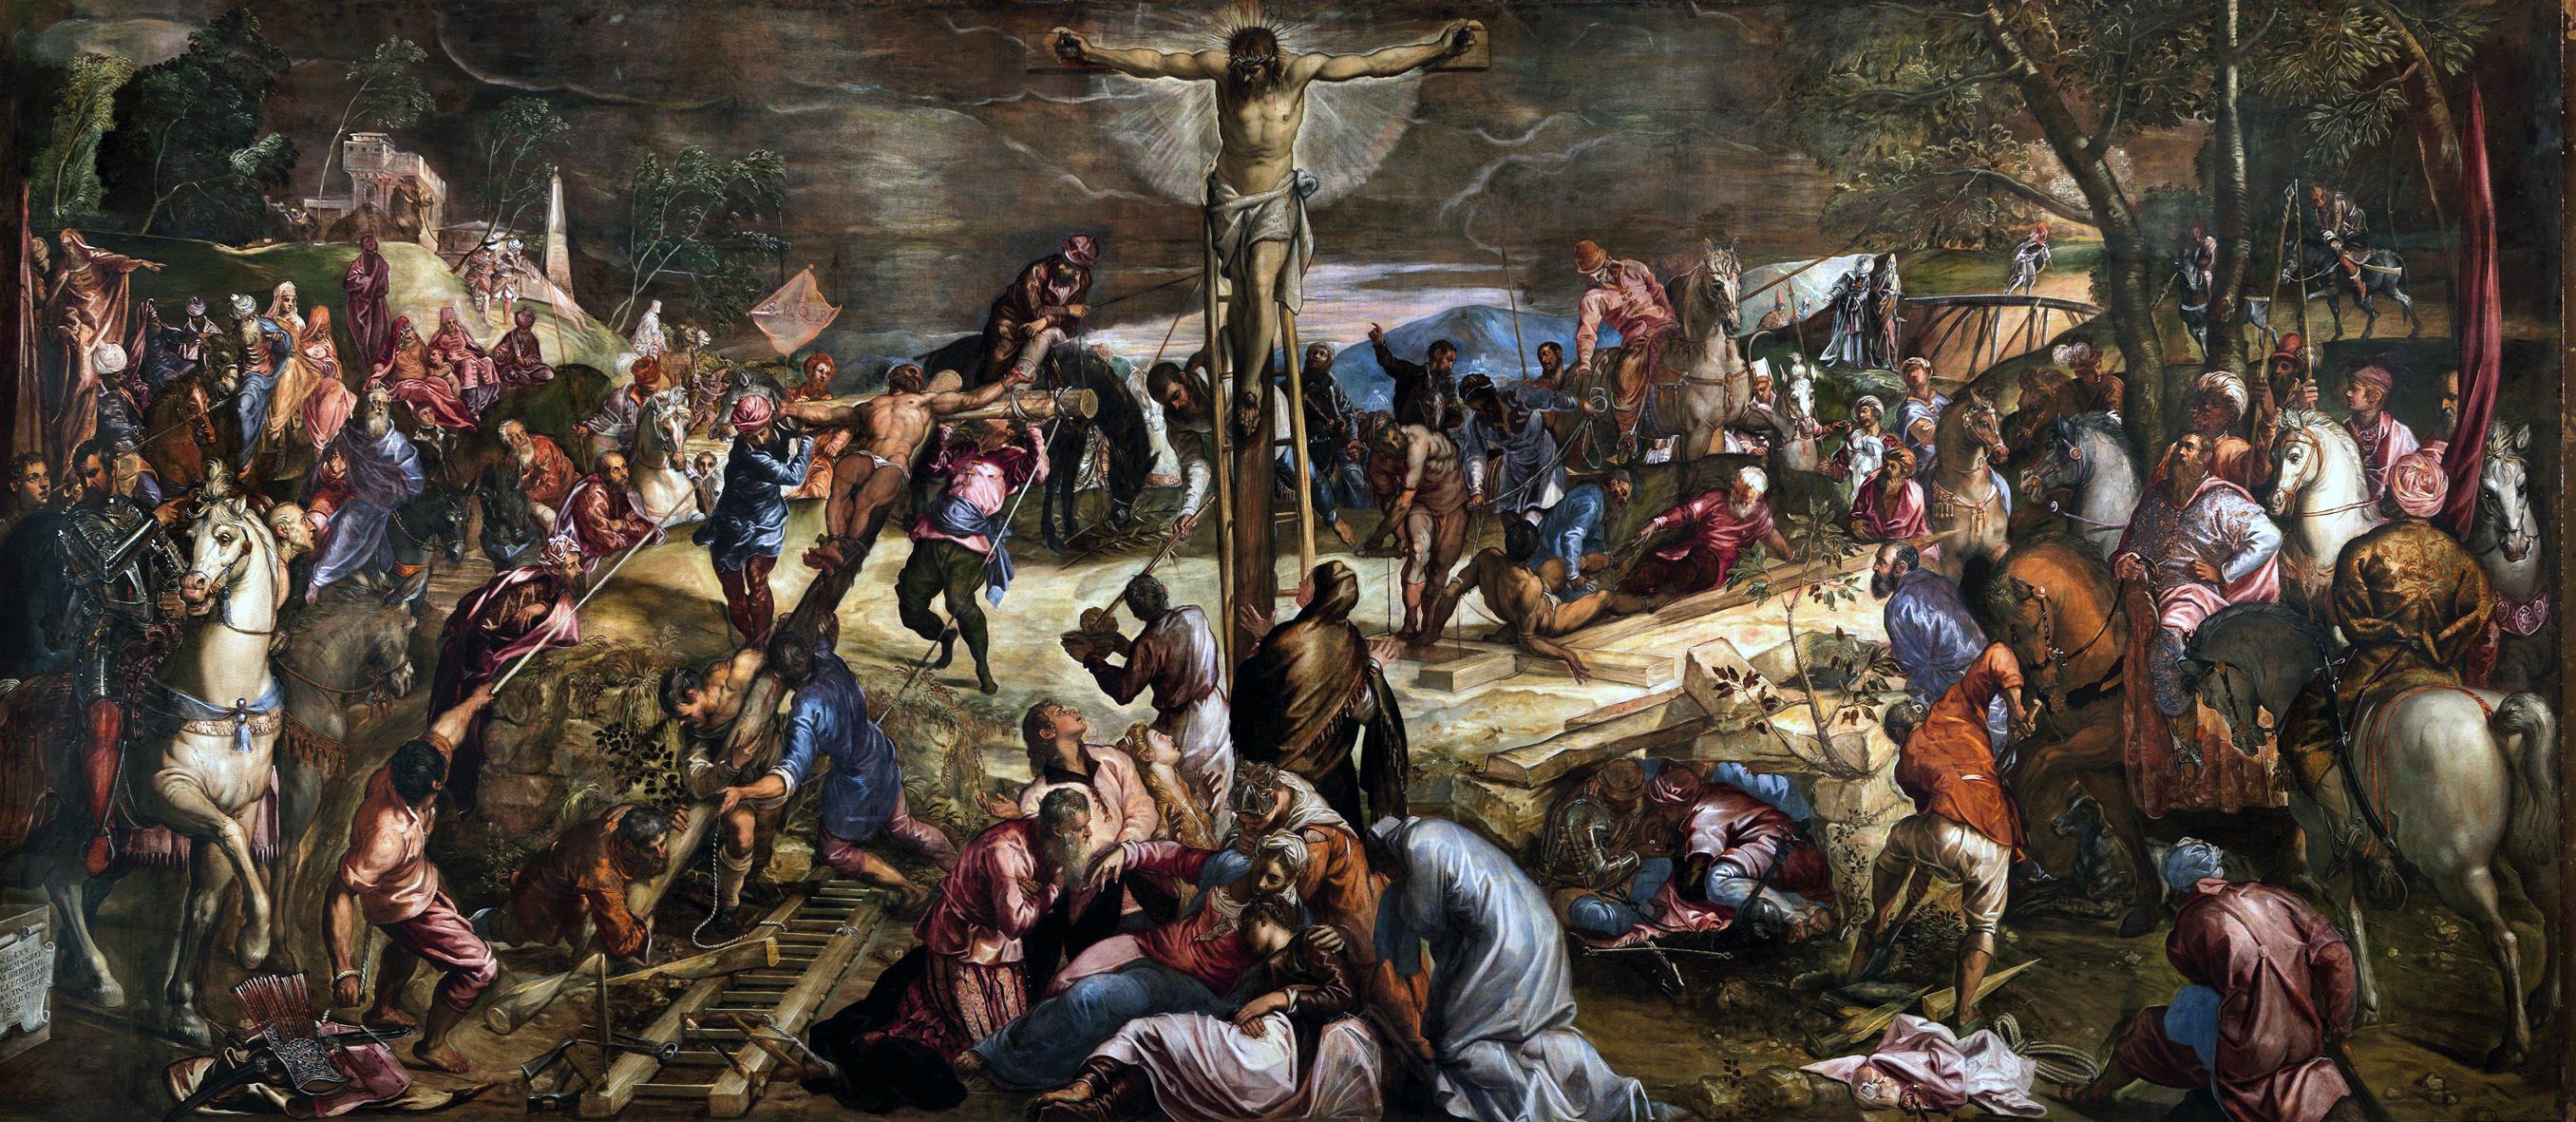 Tintoretto. Crucifixión. Scuola de San Rocco. Venecia. Foto: WGA.